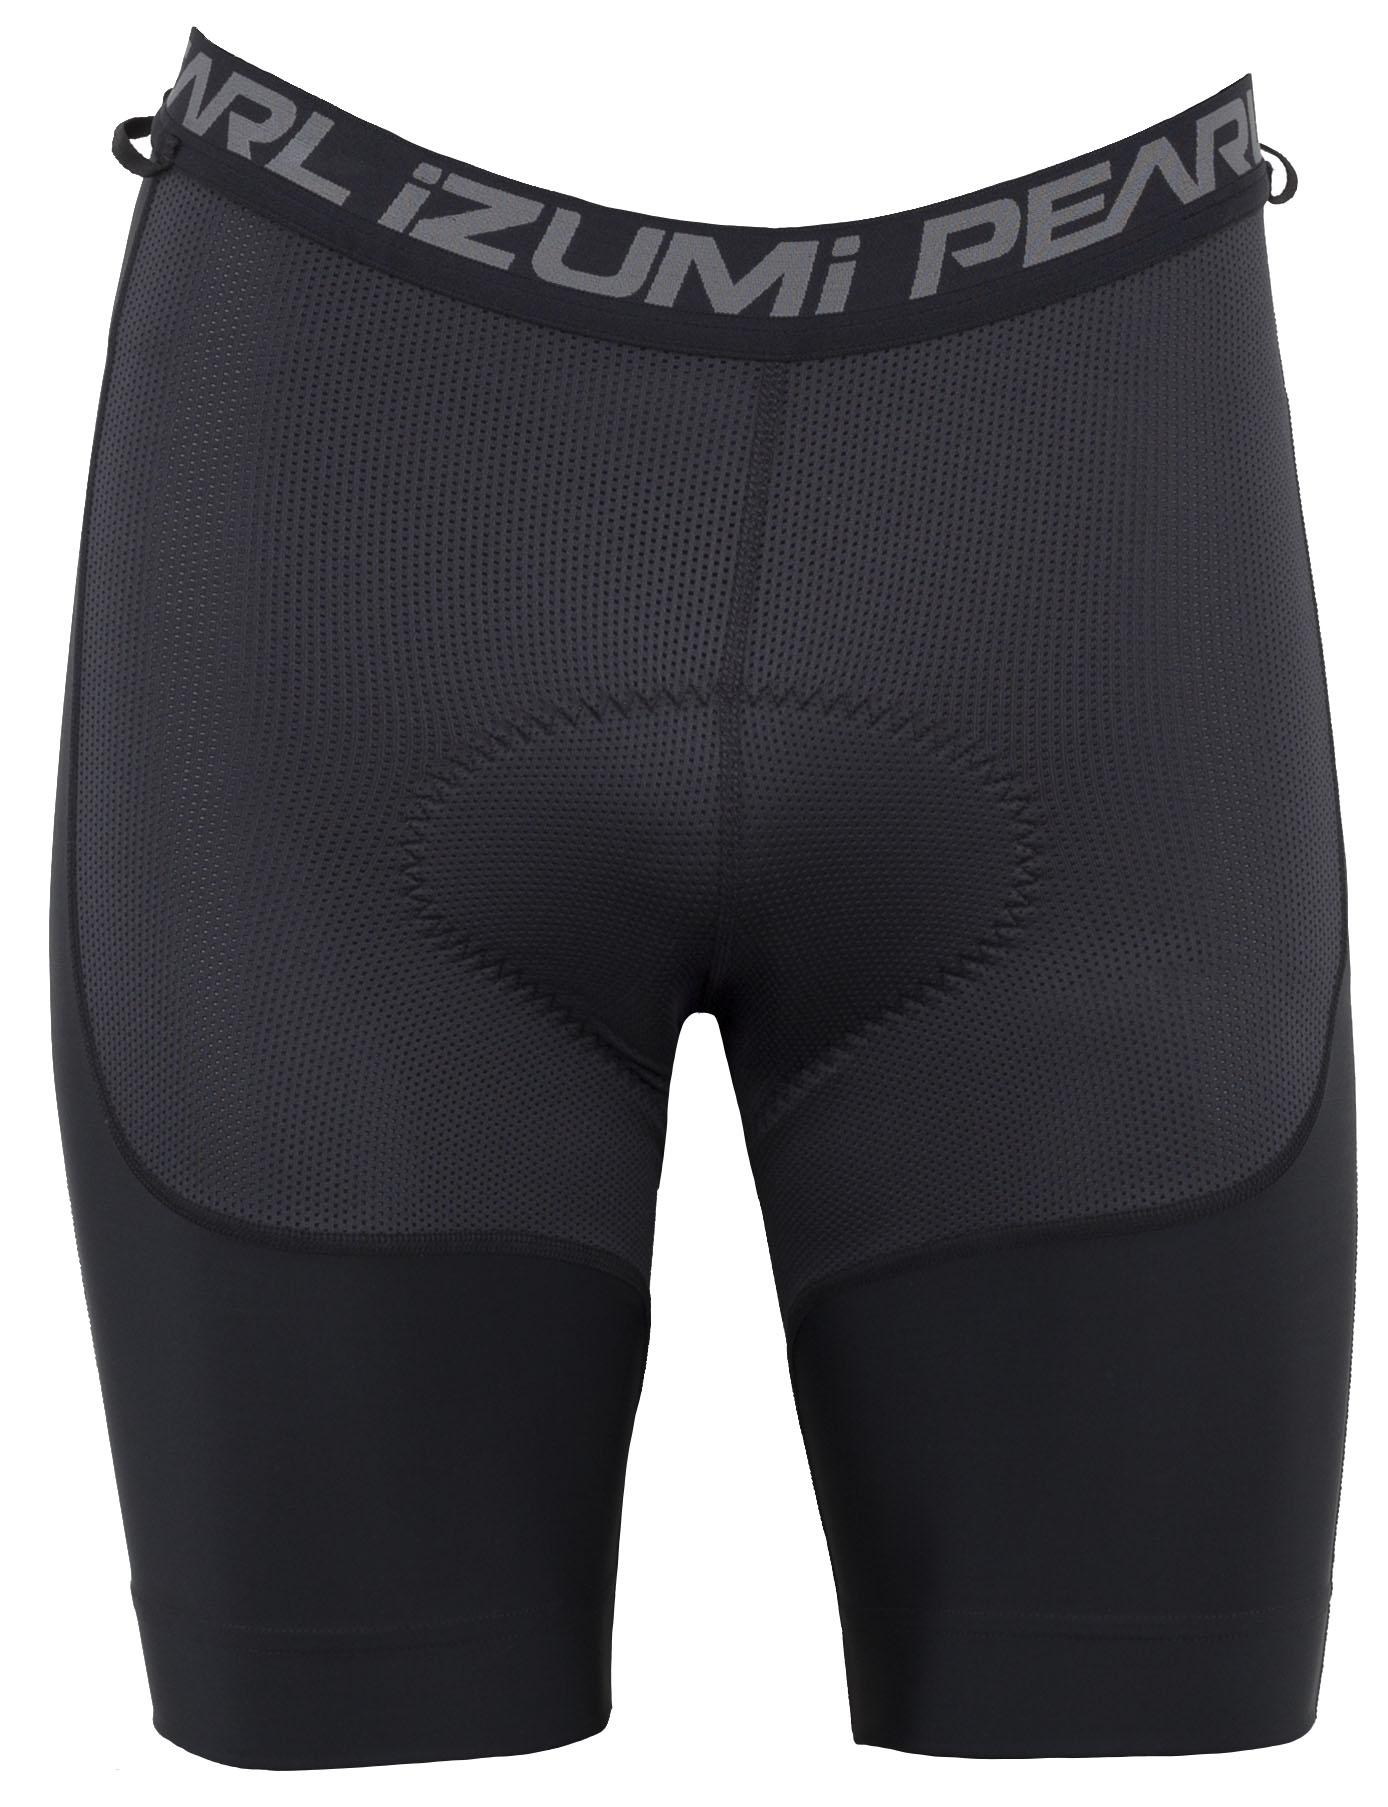 Pearl Izumi | Select Liner Shorts Men's | Size Small in Black